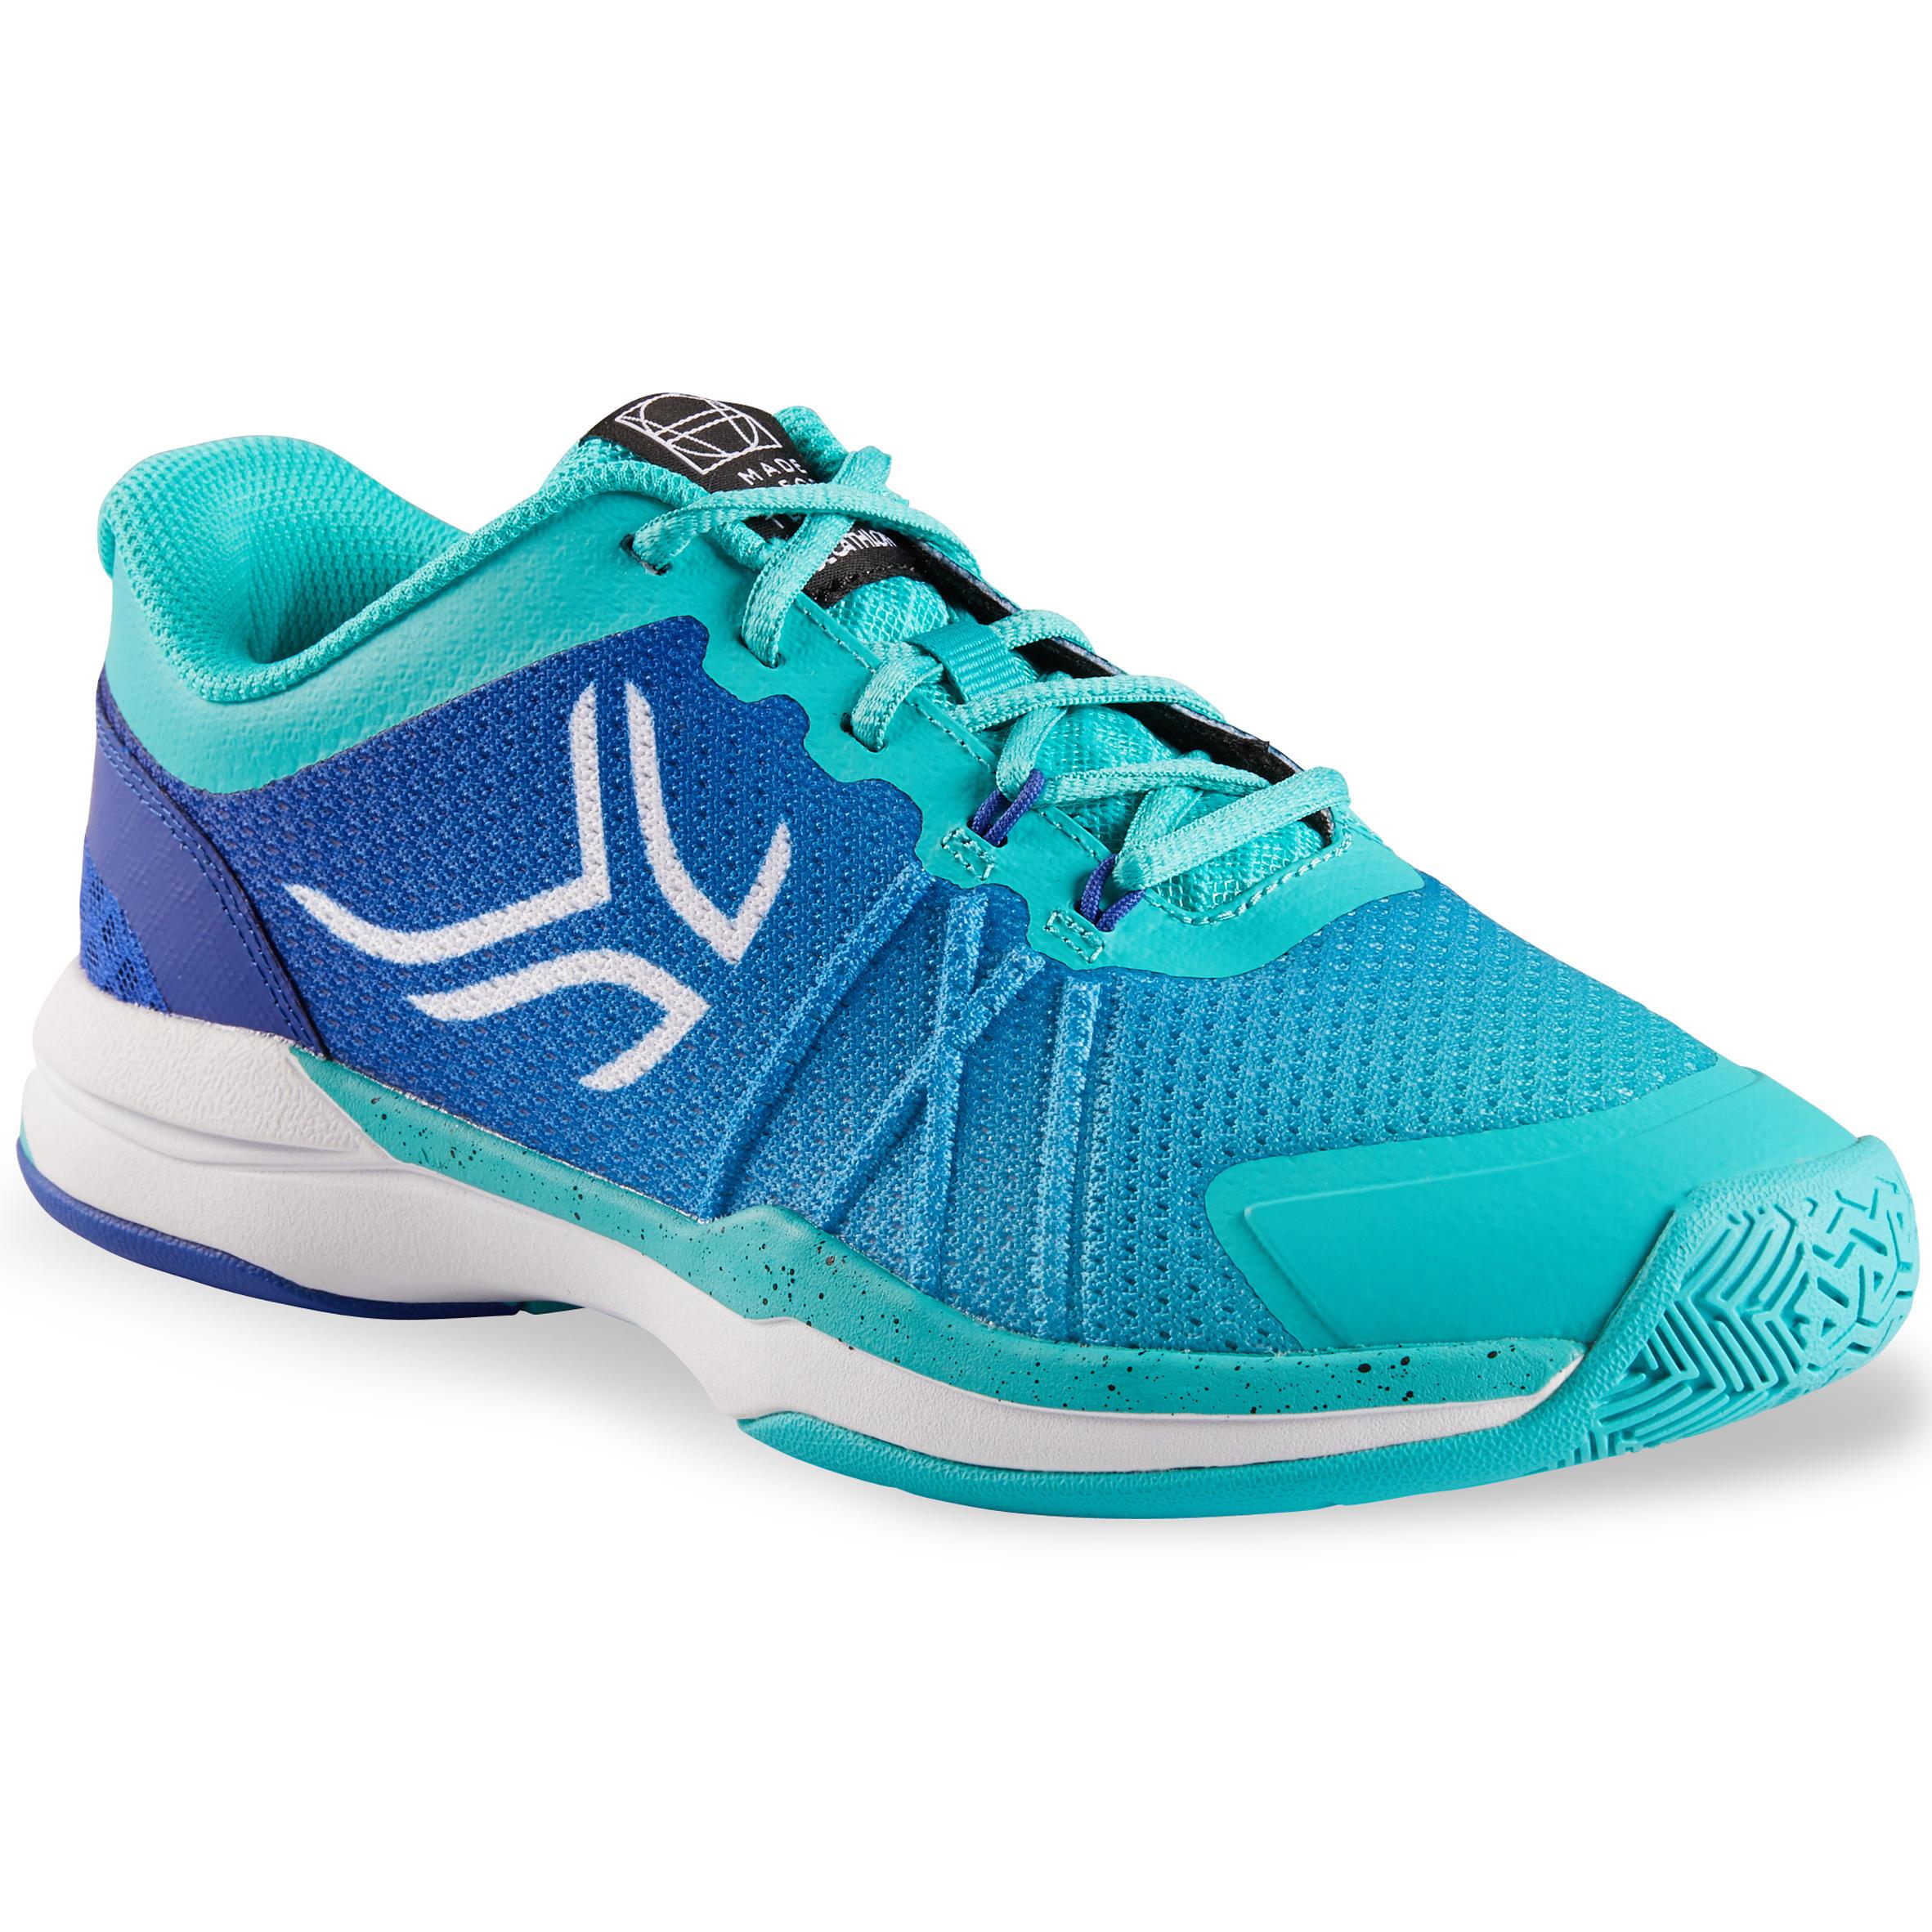 Adult Tennis Shoes Hong Kong - Tennis